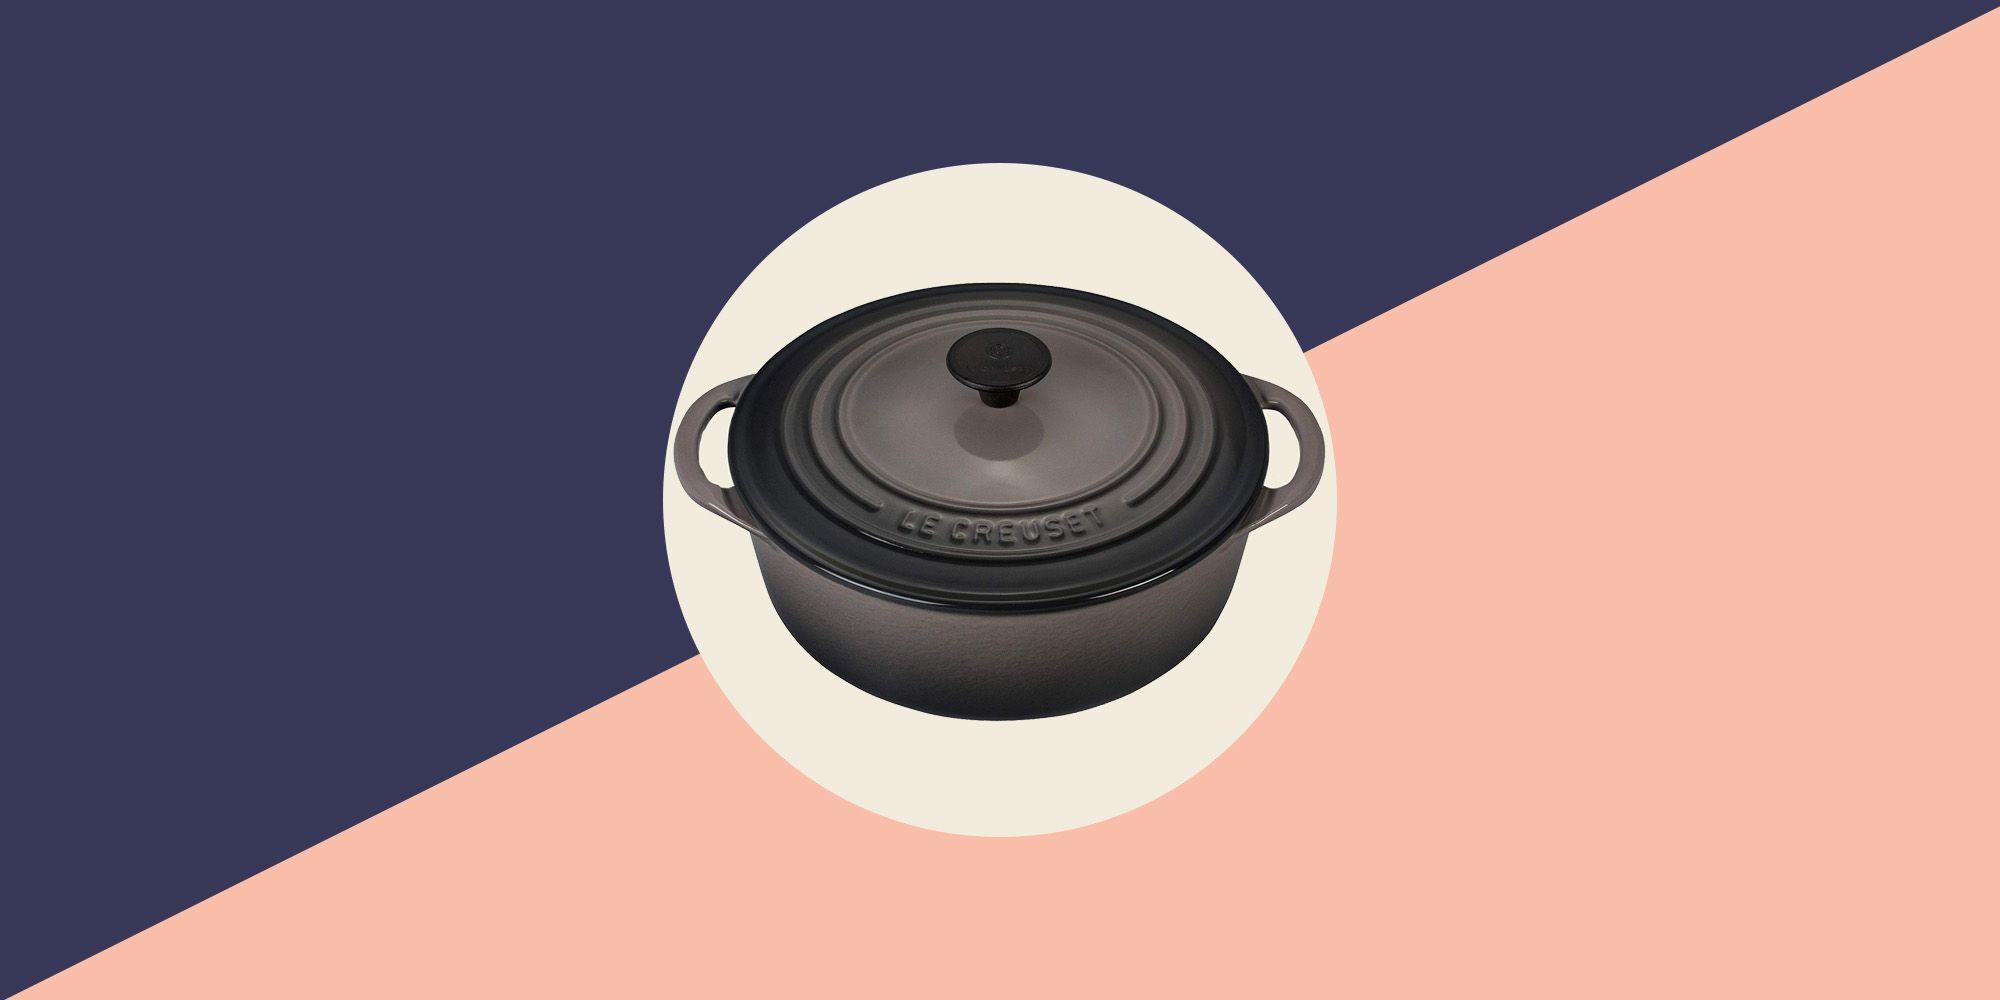 Amazon Prime Day 2019: Get 35% off this Le Creuset cast iron casserole